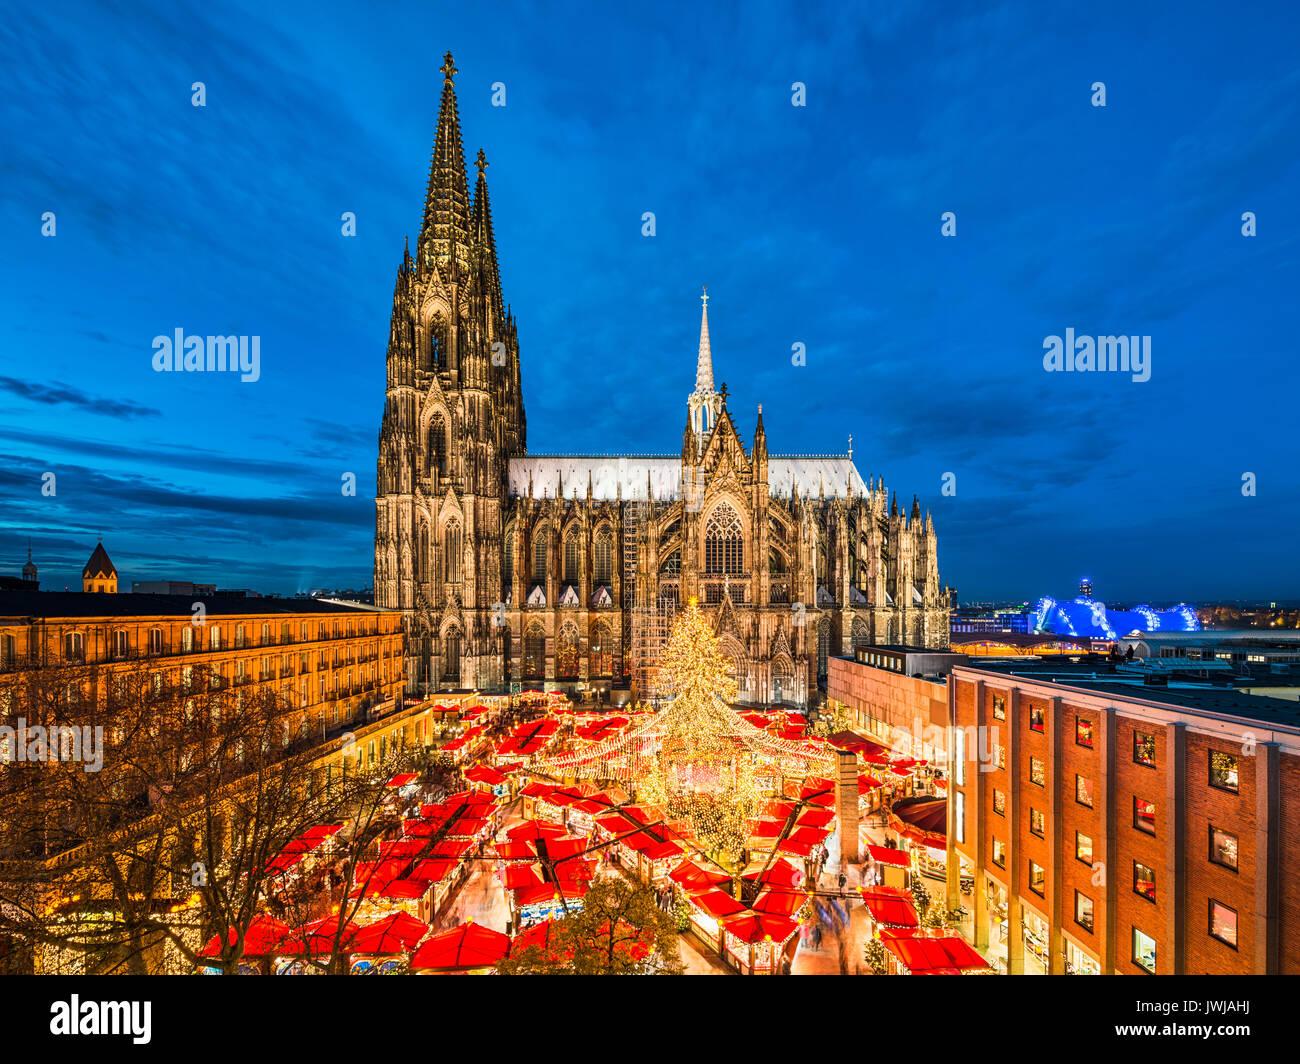 Cologne Christmas Market Stock Photos & Cologne Christmas Market ...